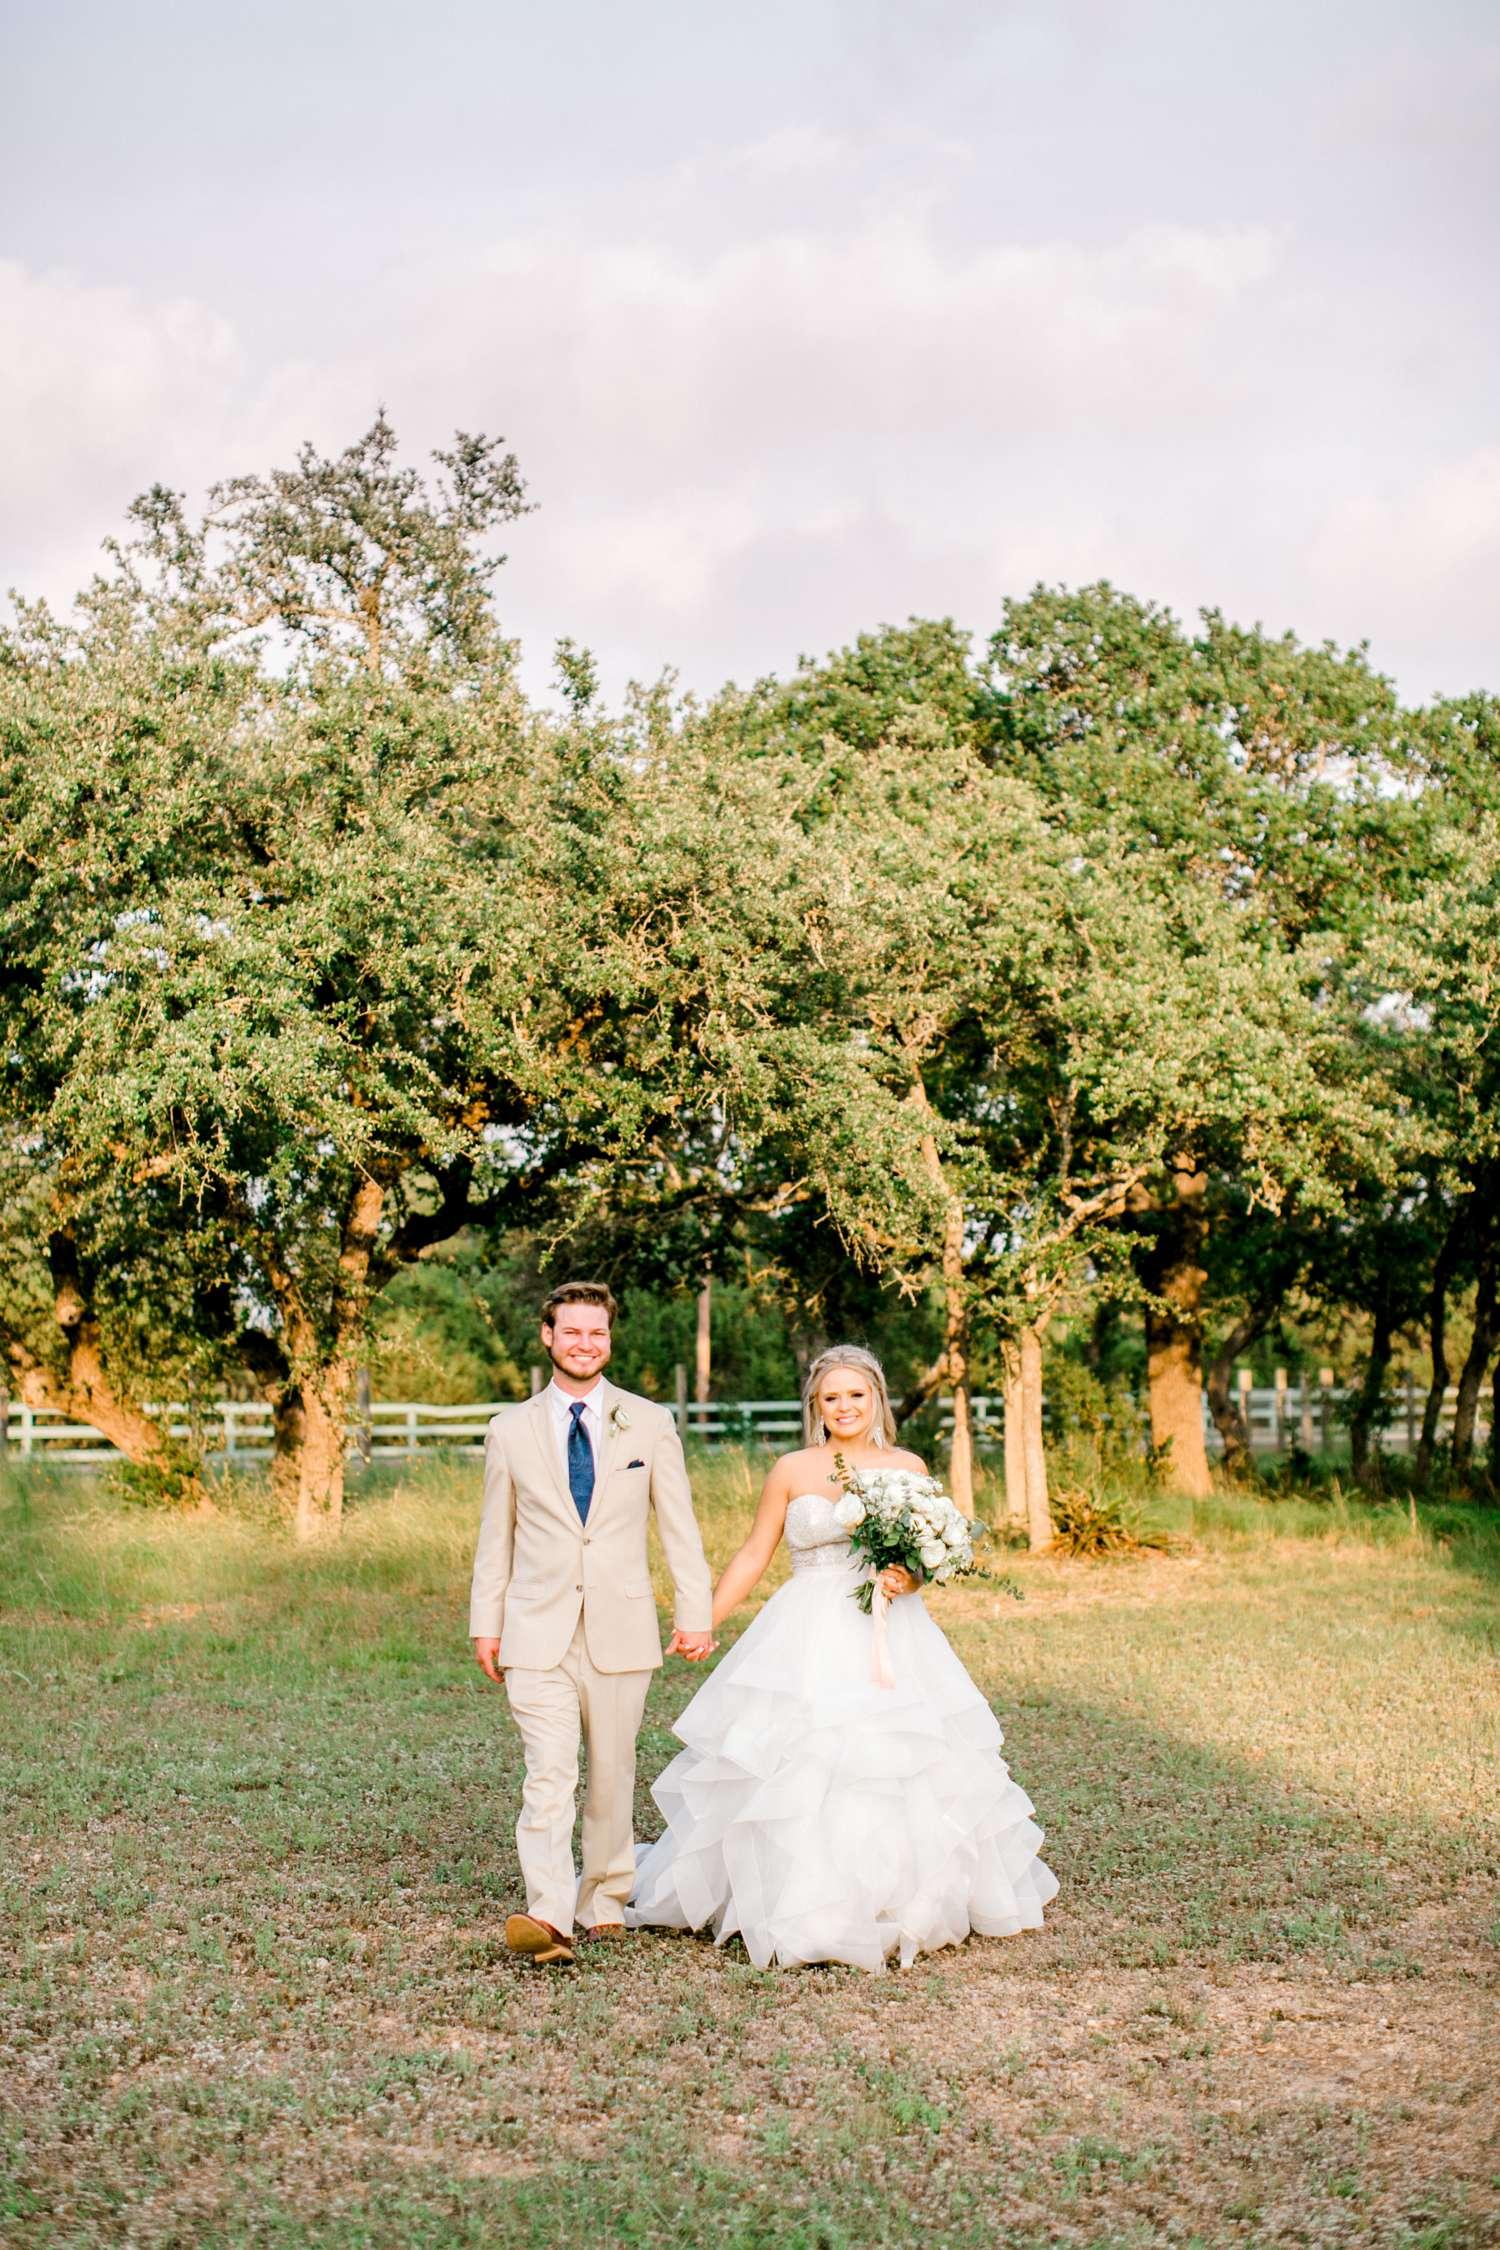 HAYLEE+JUSTIN+GREGORY+HERITAGE_HAUS_AUSTIN_TEXAS_WEDDING_0129.jpg